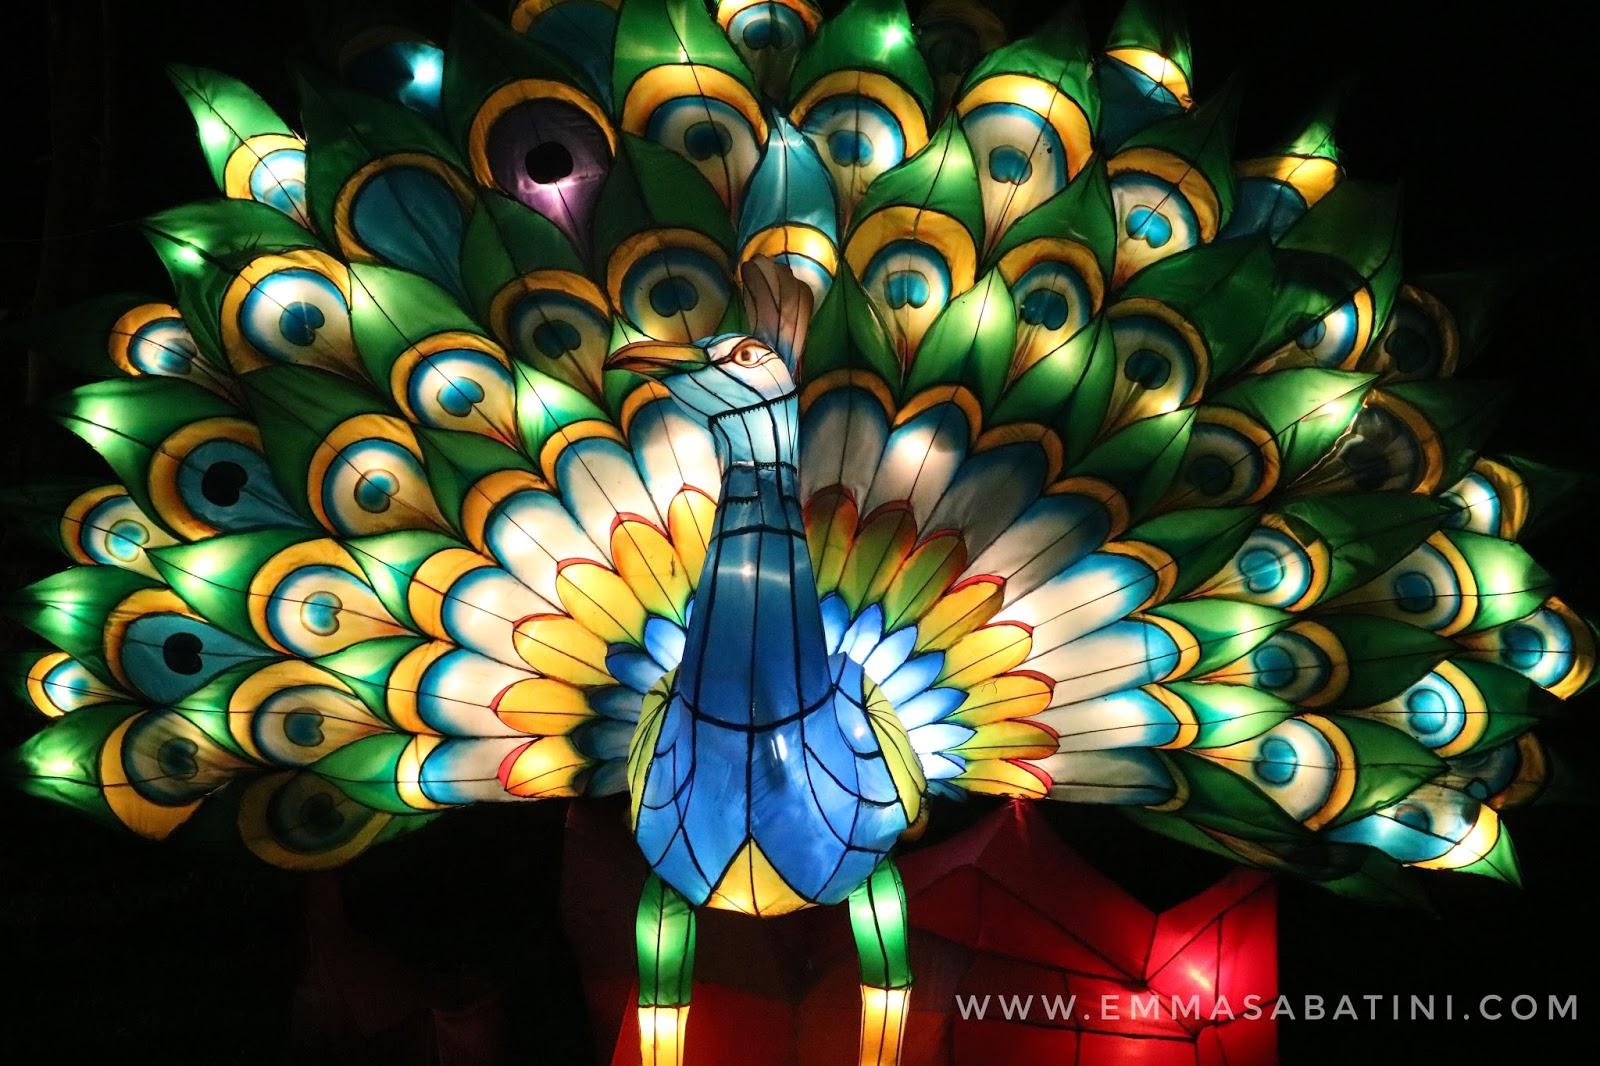 Festival of Light Cilegon Banten - Emma Sabatini